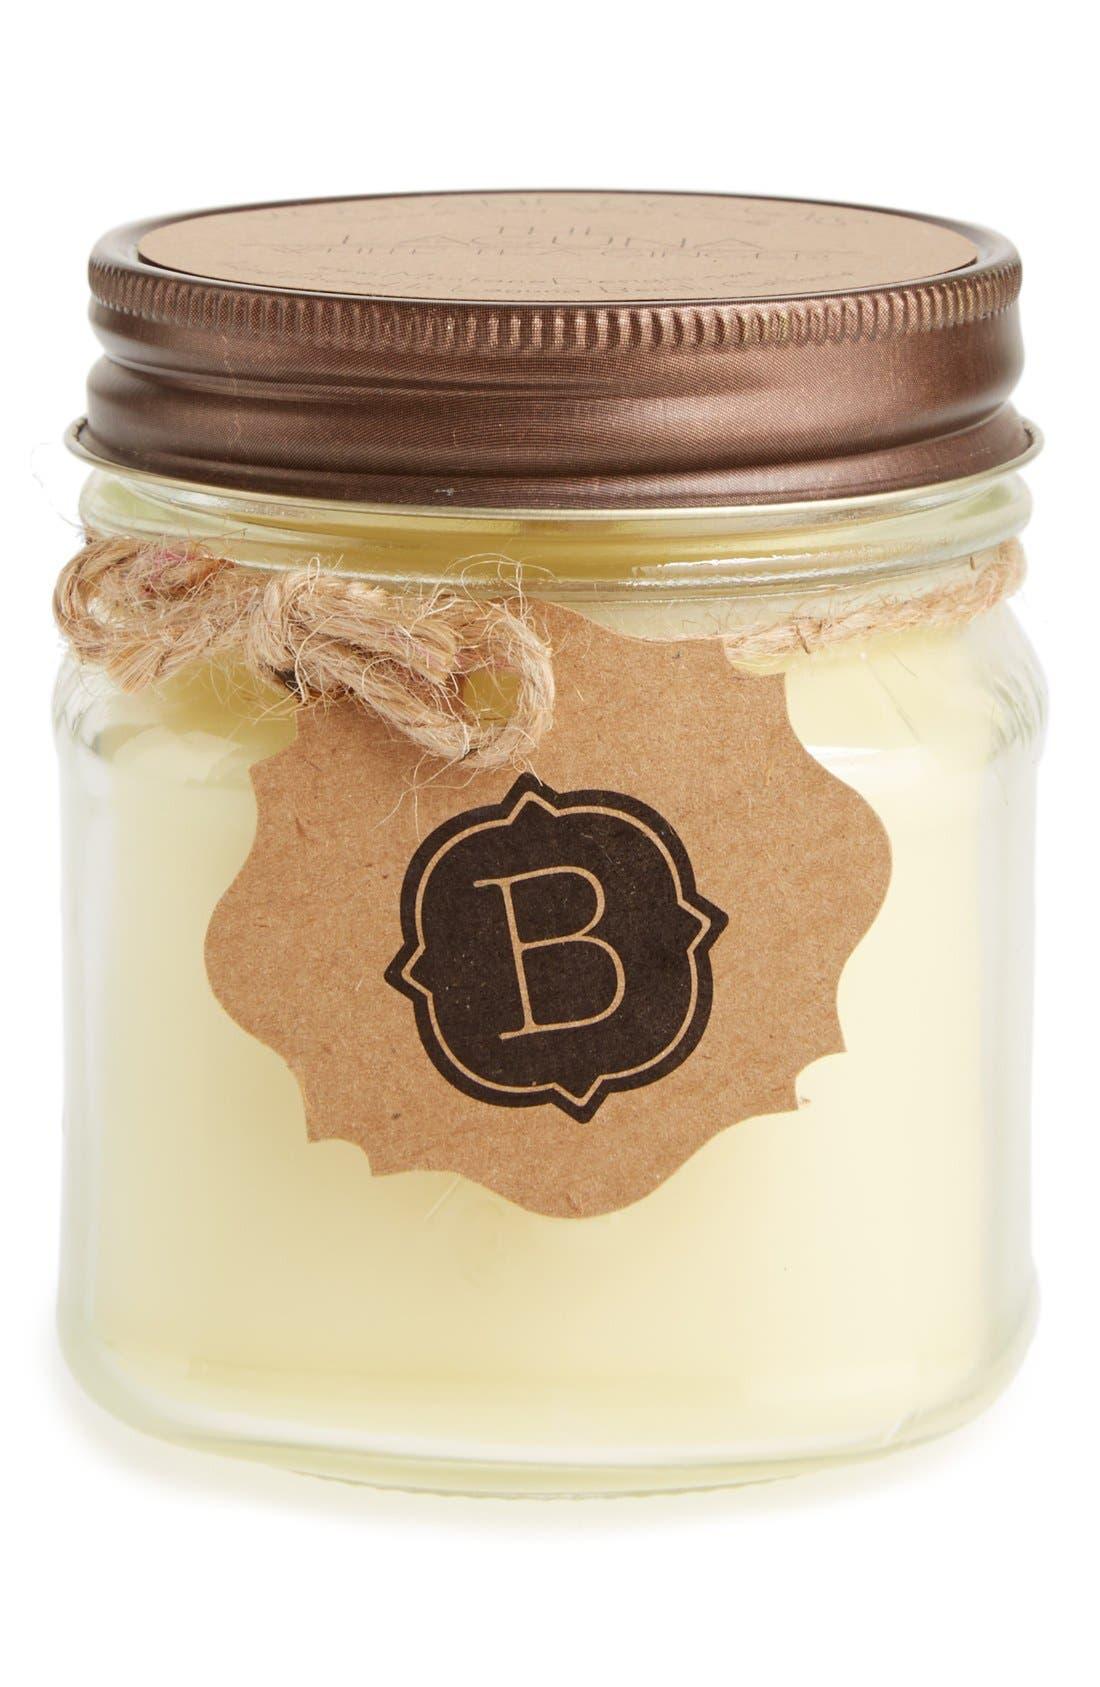 Alternate Image 1 Selected - Montane Designs Personalized Mini Mason Jar White Tea Ginger Candle